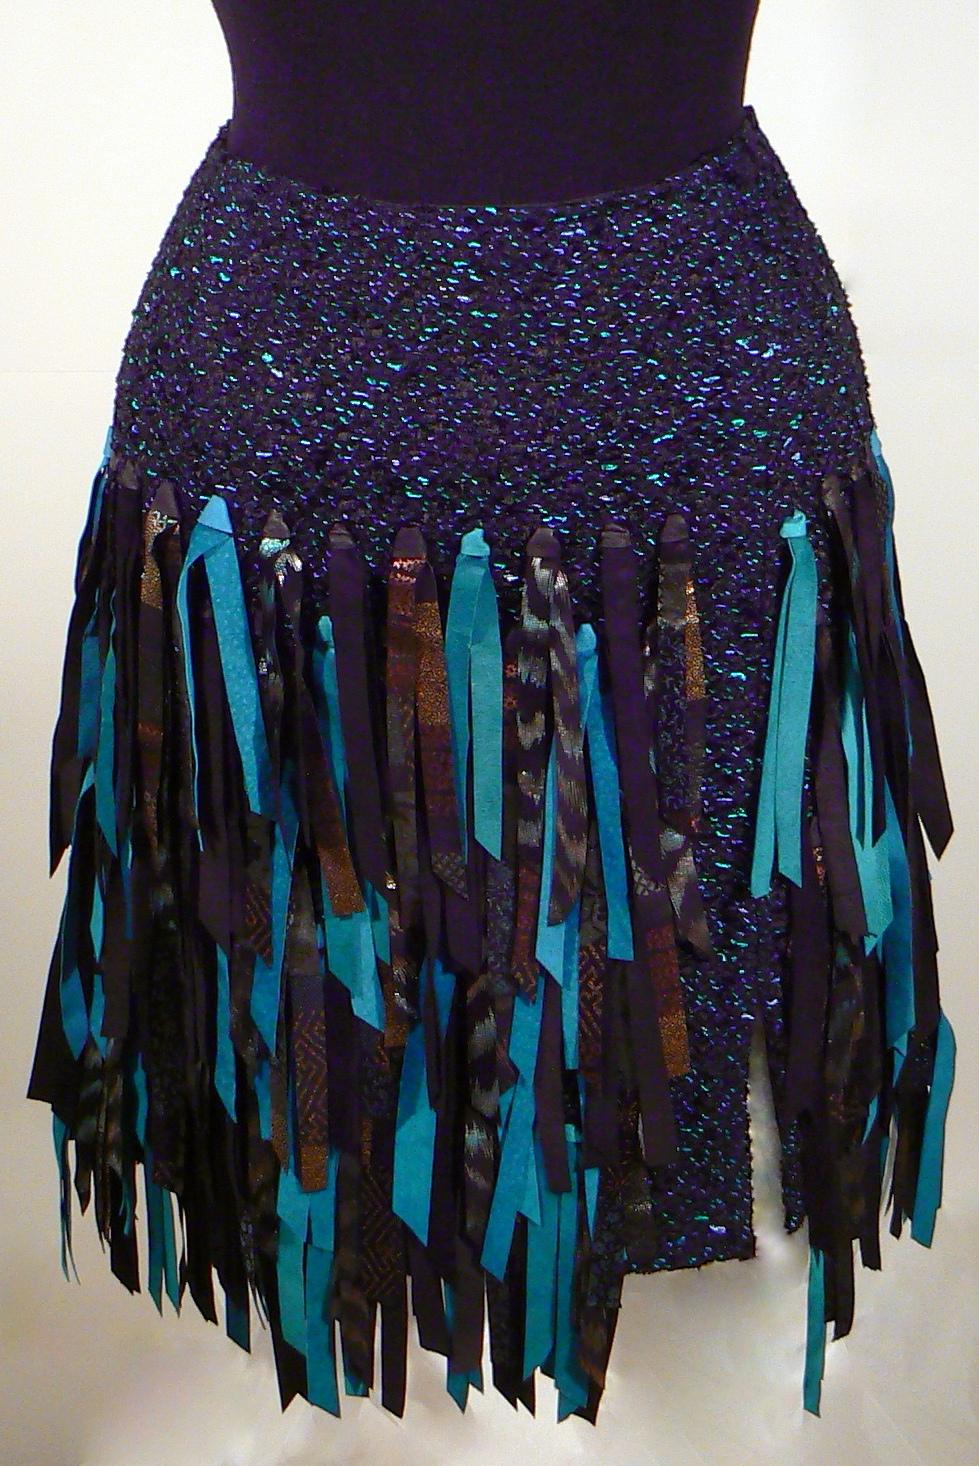 Handwoven Leather Skirt K Weir-West.JPG